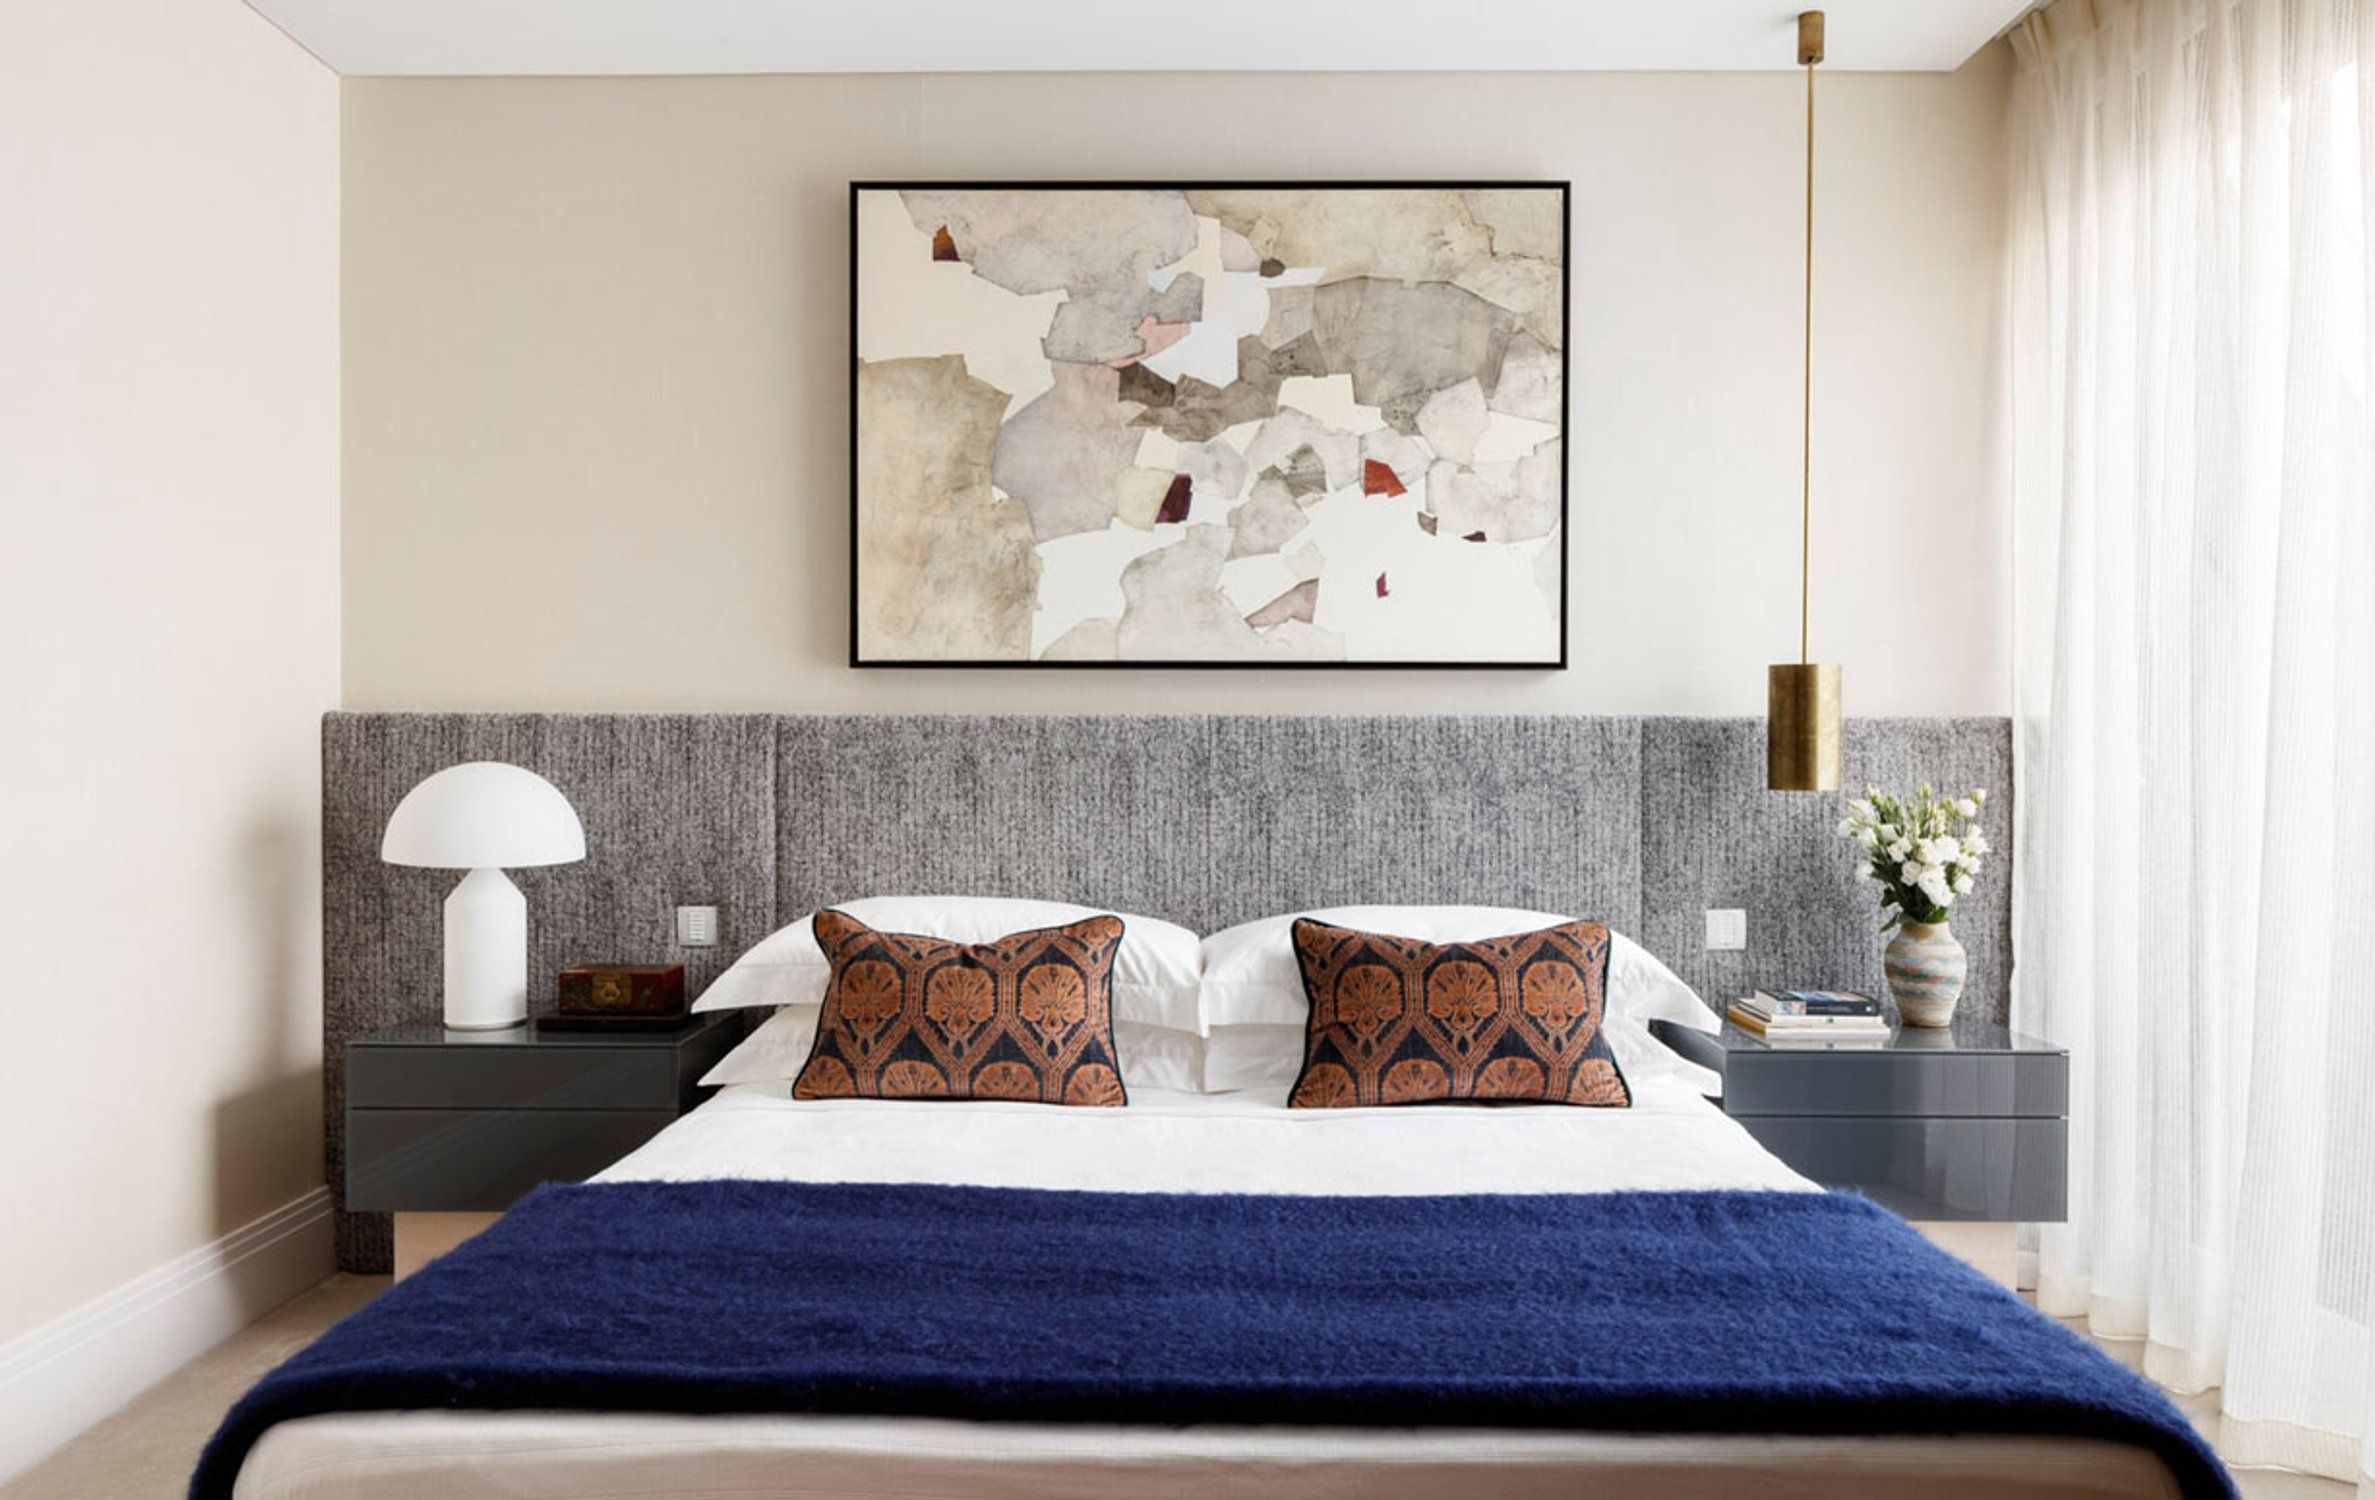 50 stylish bedroom design ideas modern bedrooms decorating tips rh housebeautiful com  gorgeous bedroom decorating ideas